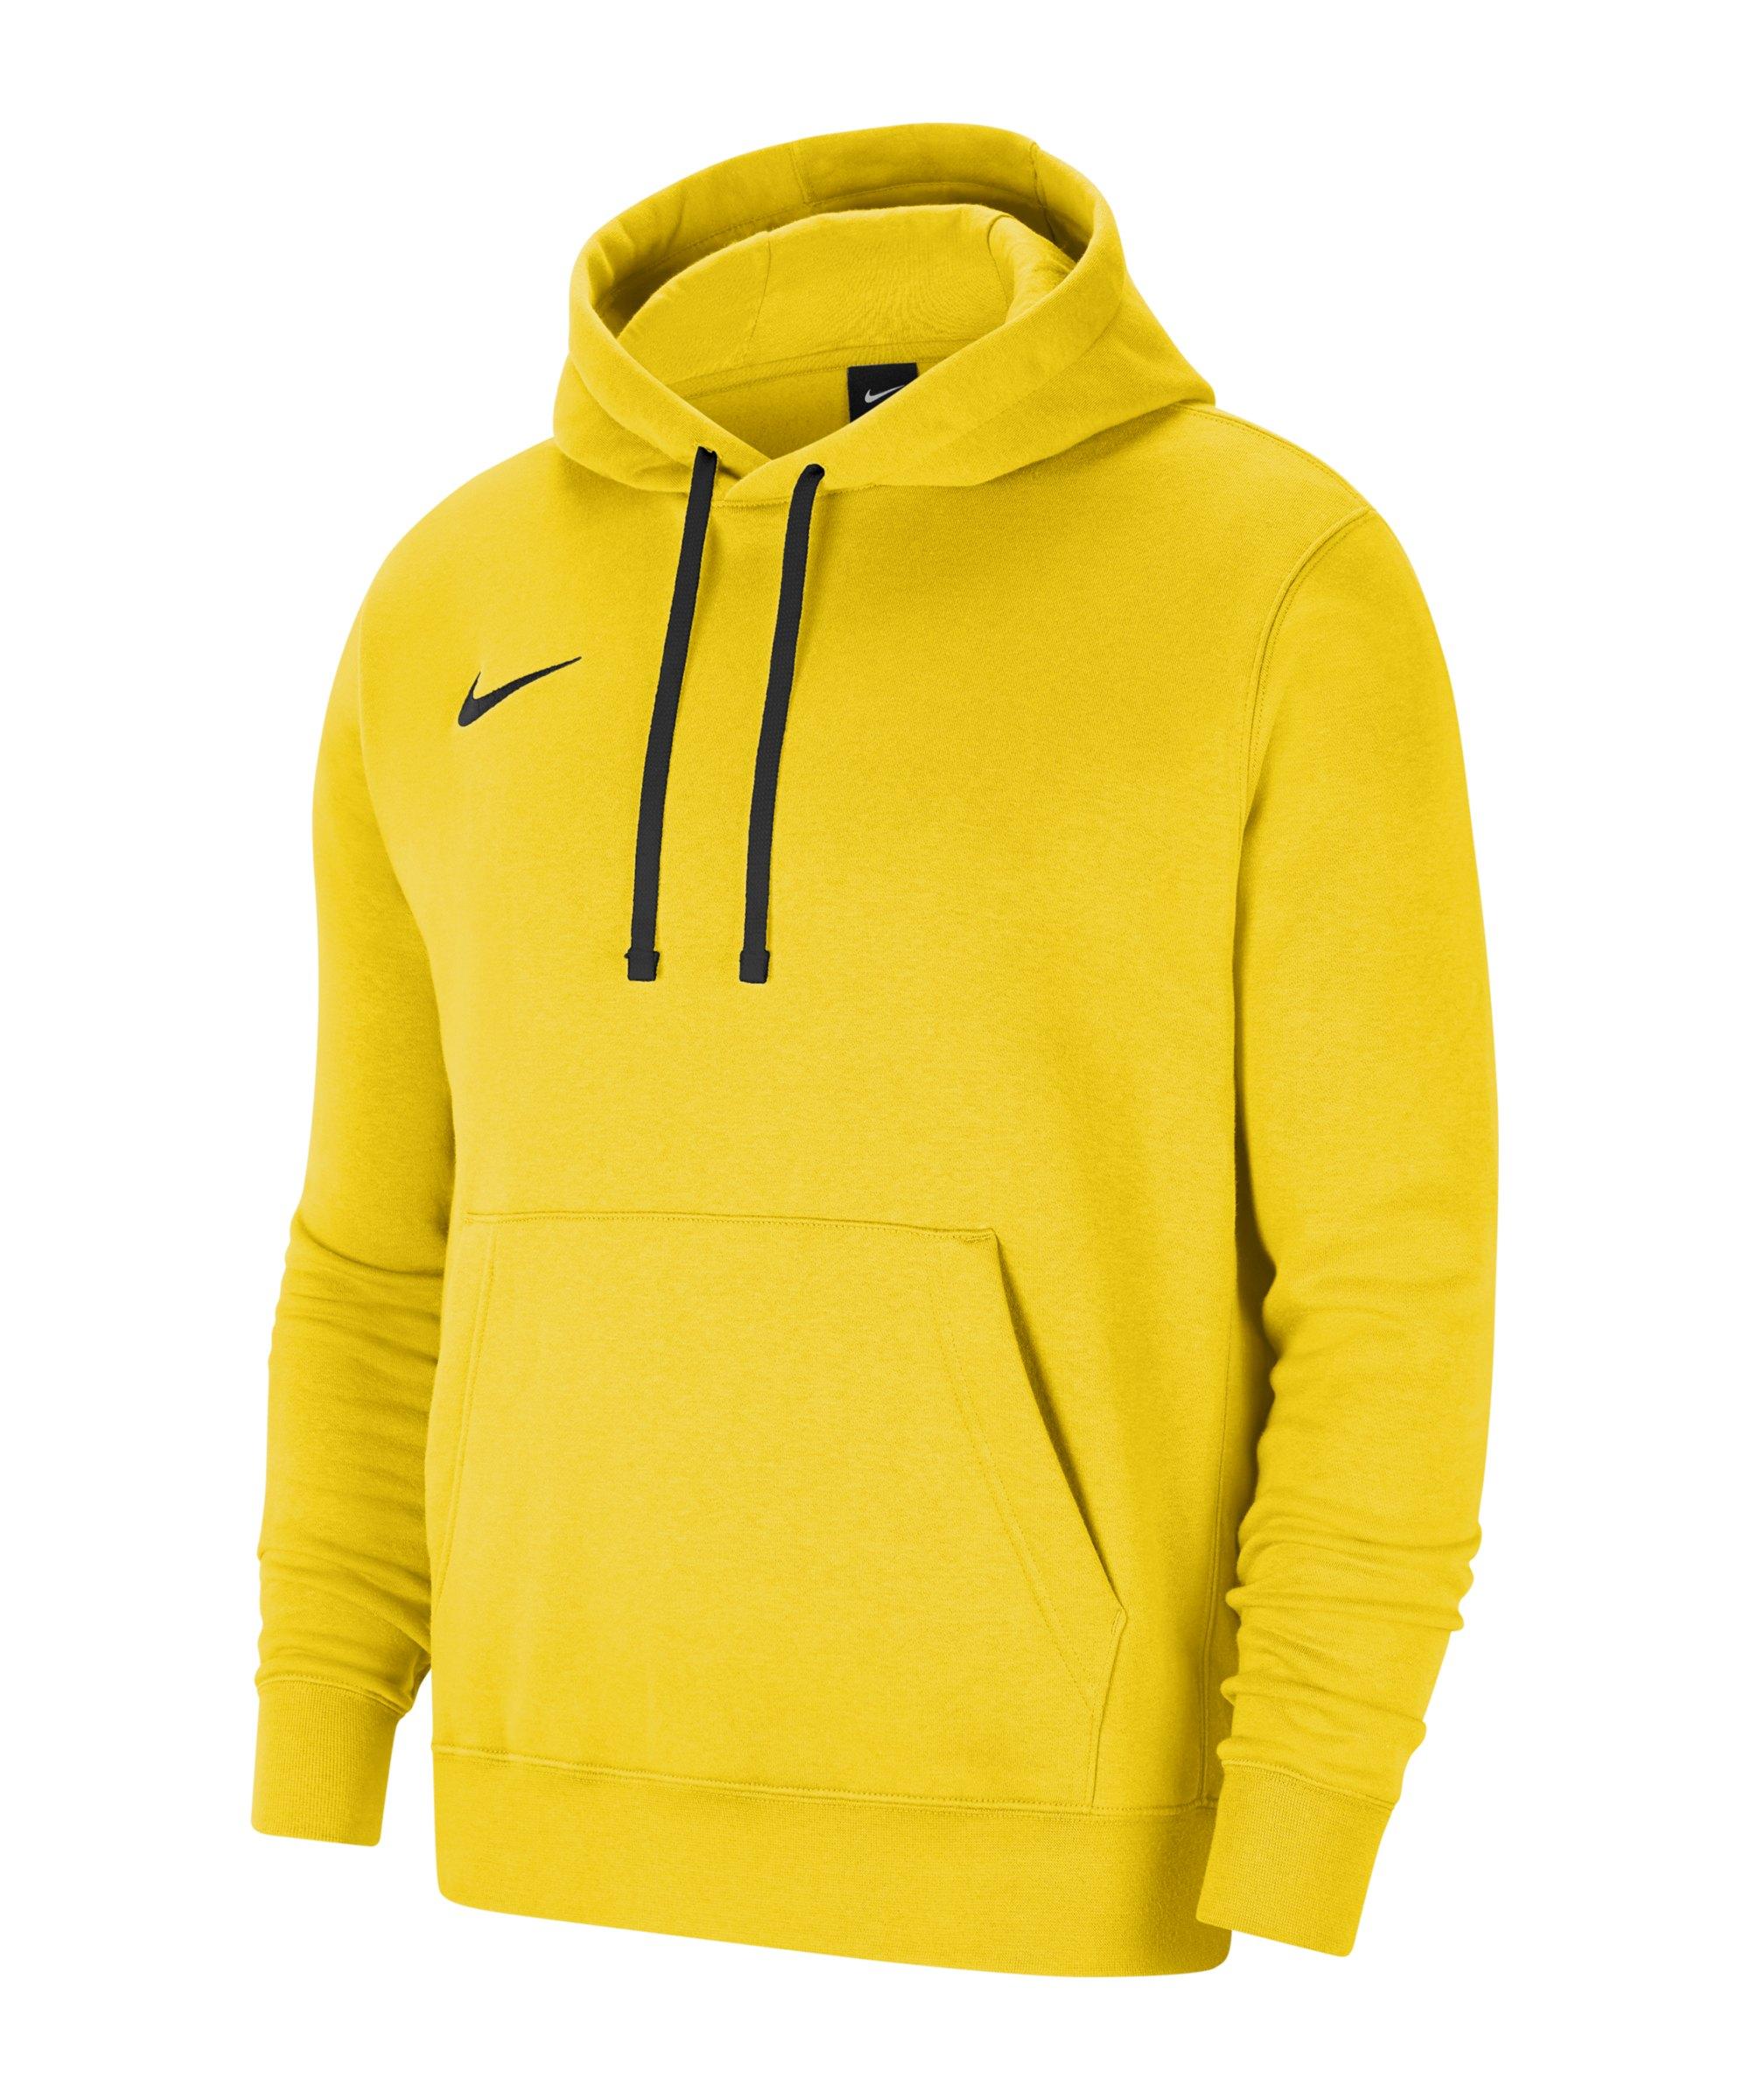 Nike Park 20 Fleece Hoody Gelb Schwarz F719 - gelb